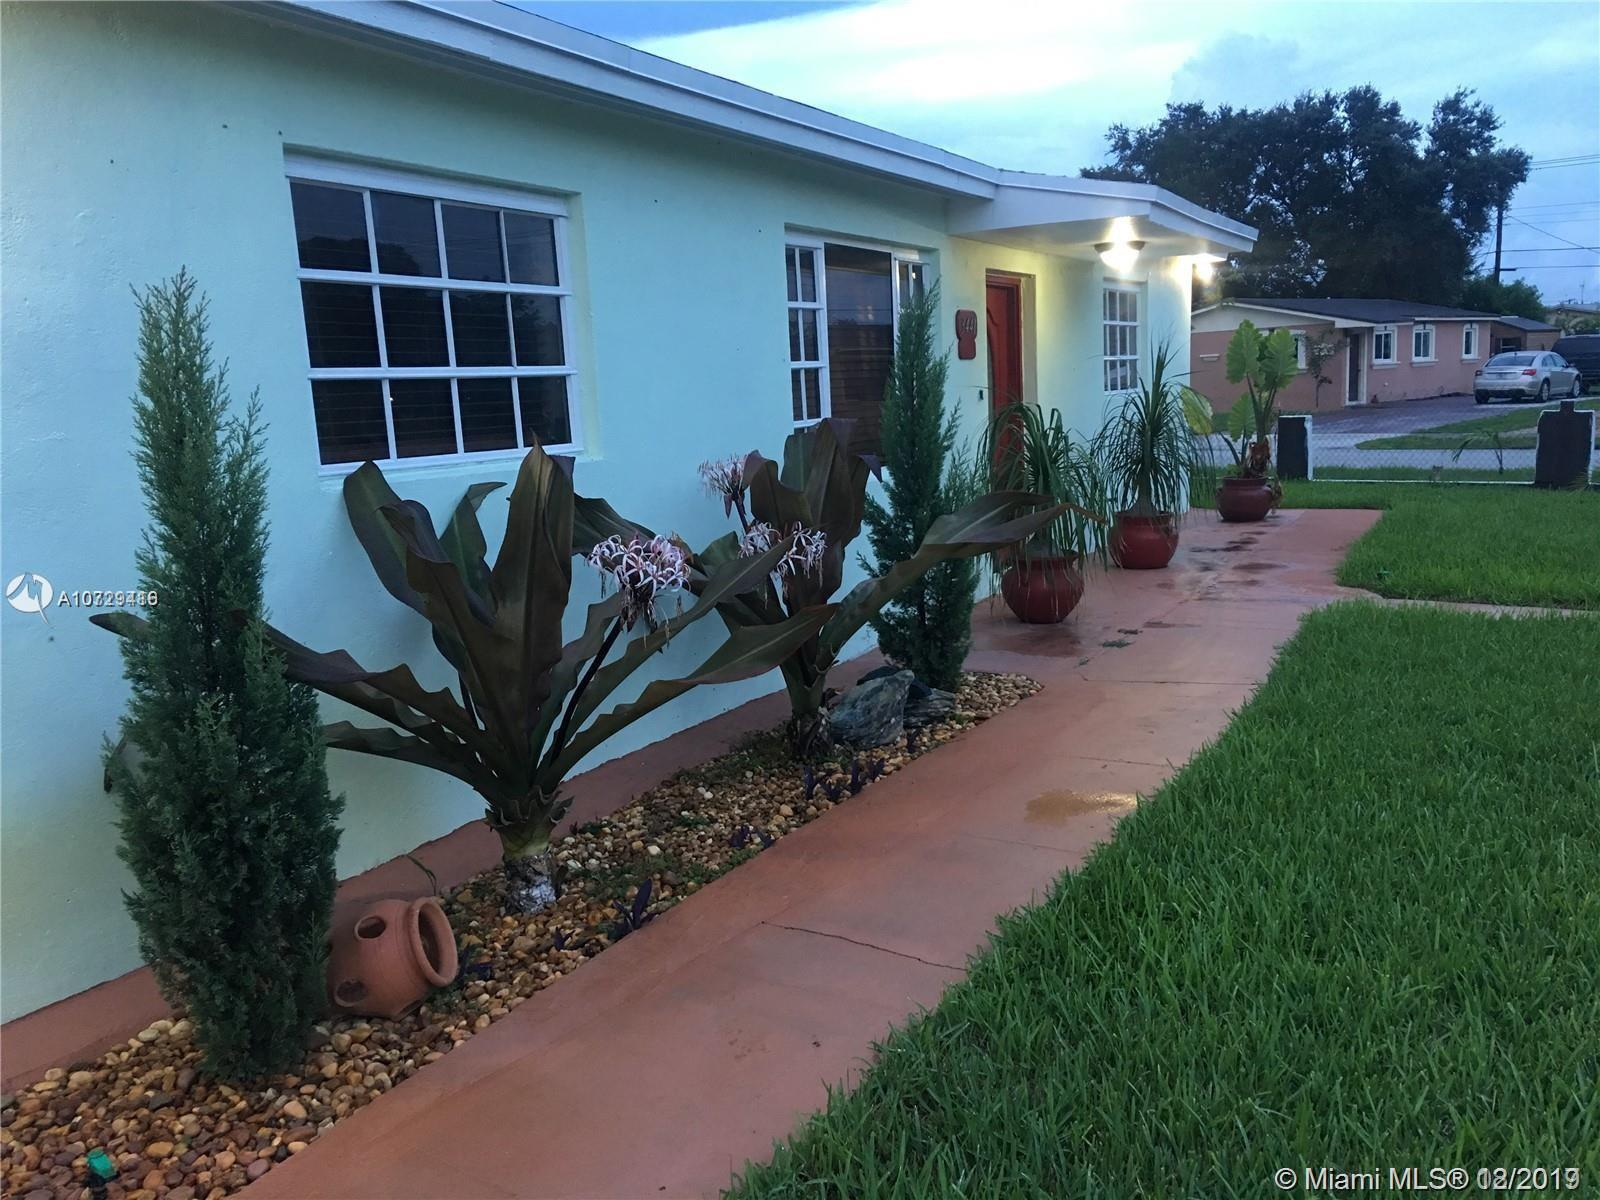 3441 NW 208th St, Miami Gardens, FL 33056